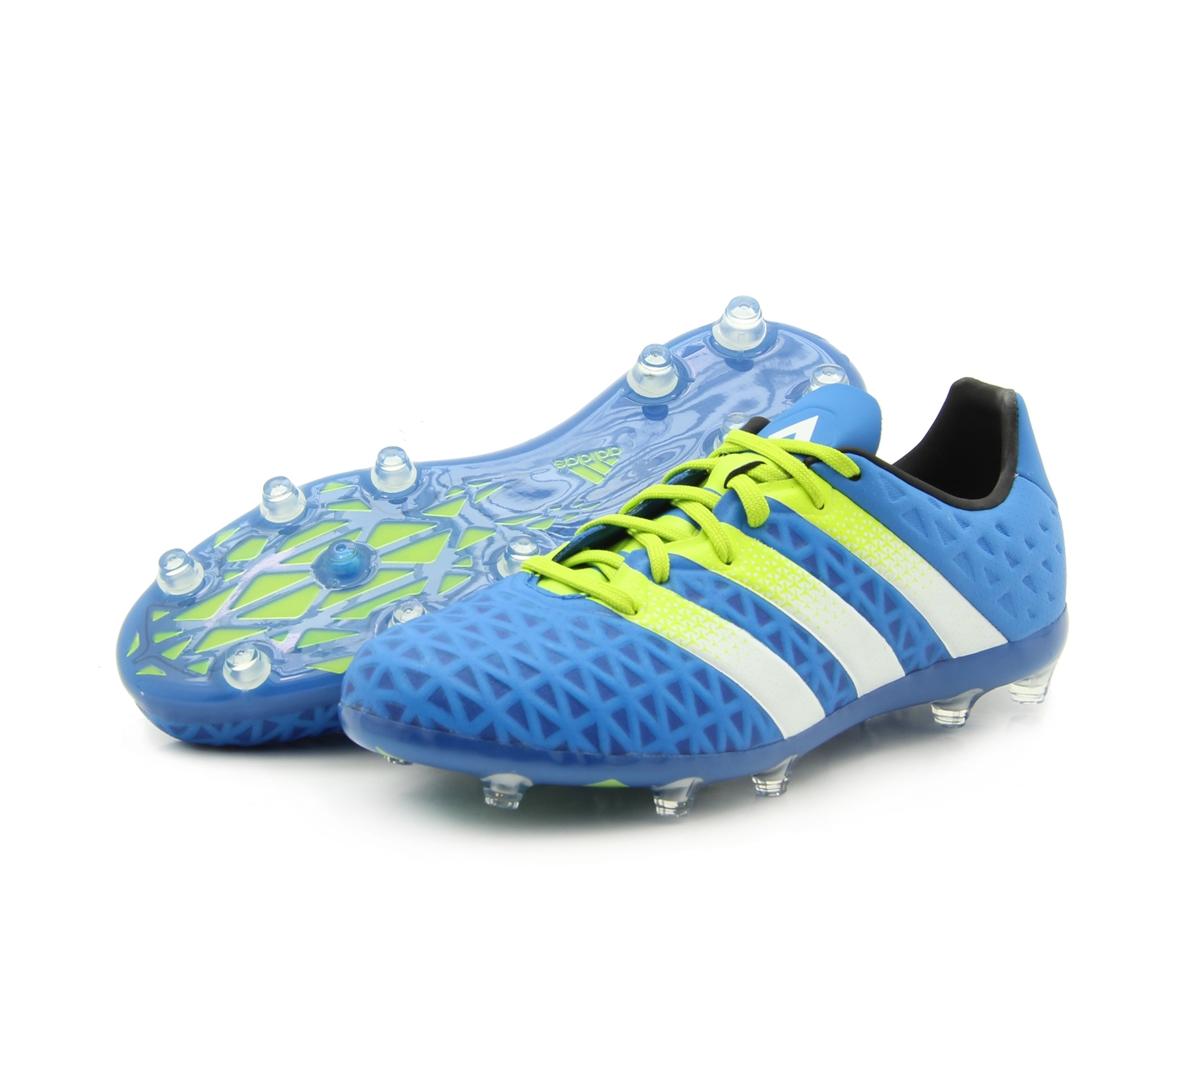 a2bd8037c Adidas Children s Football Shoes Ace 16.1 Fg Ag J AF5089  22